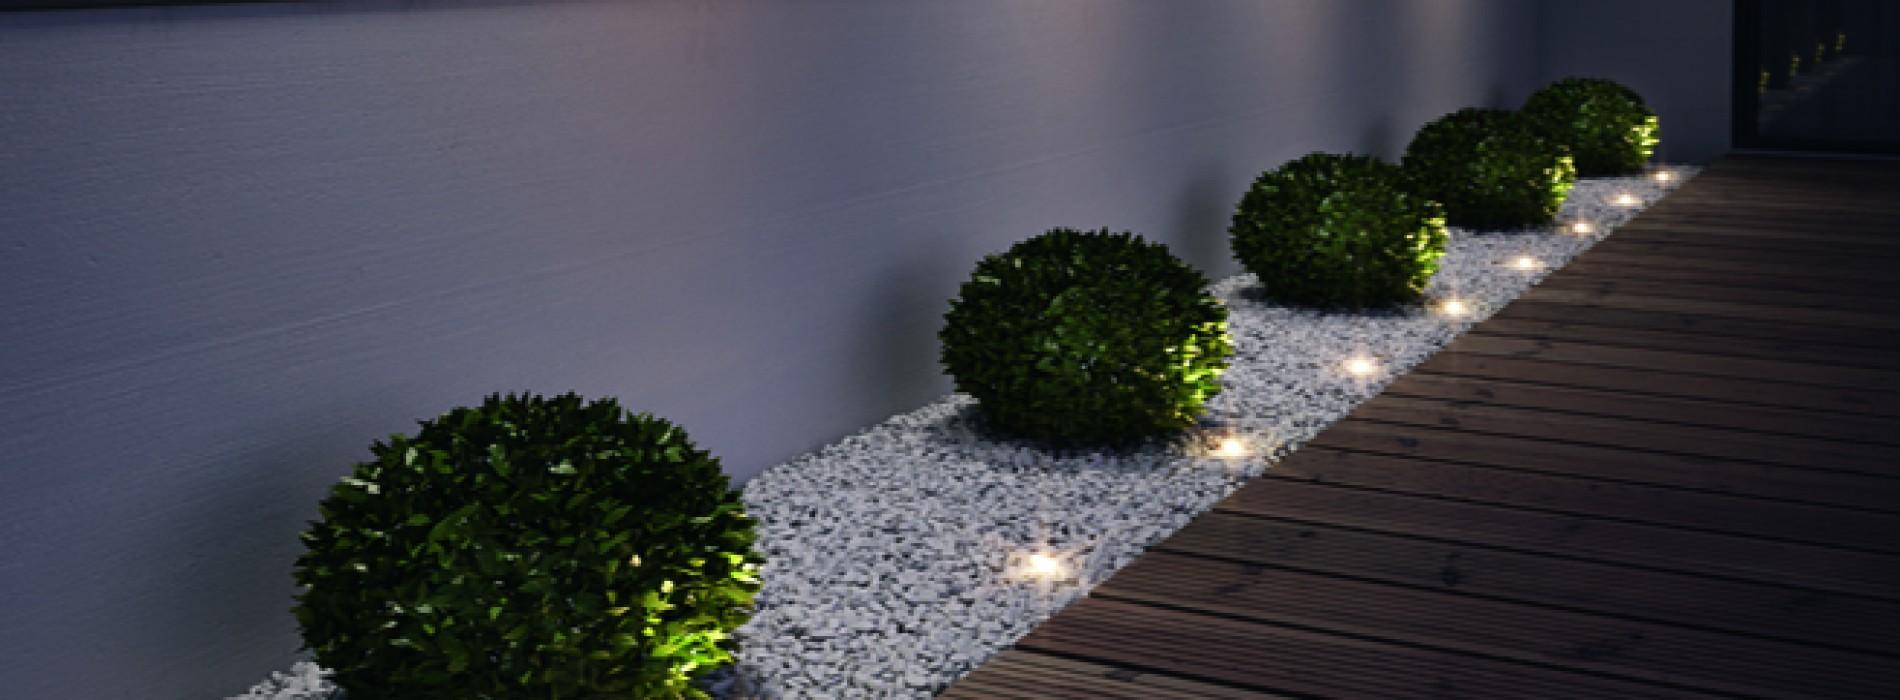 Iluminacion de jardin exterior dise os arquitect nicos for Iluminacion para jardines